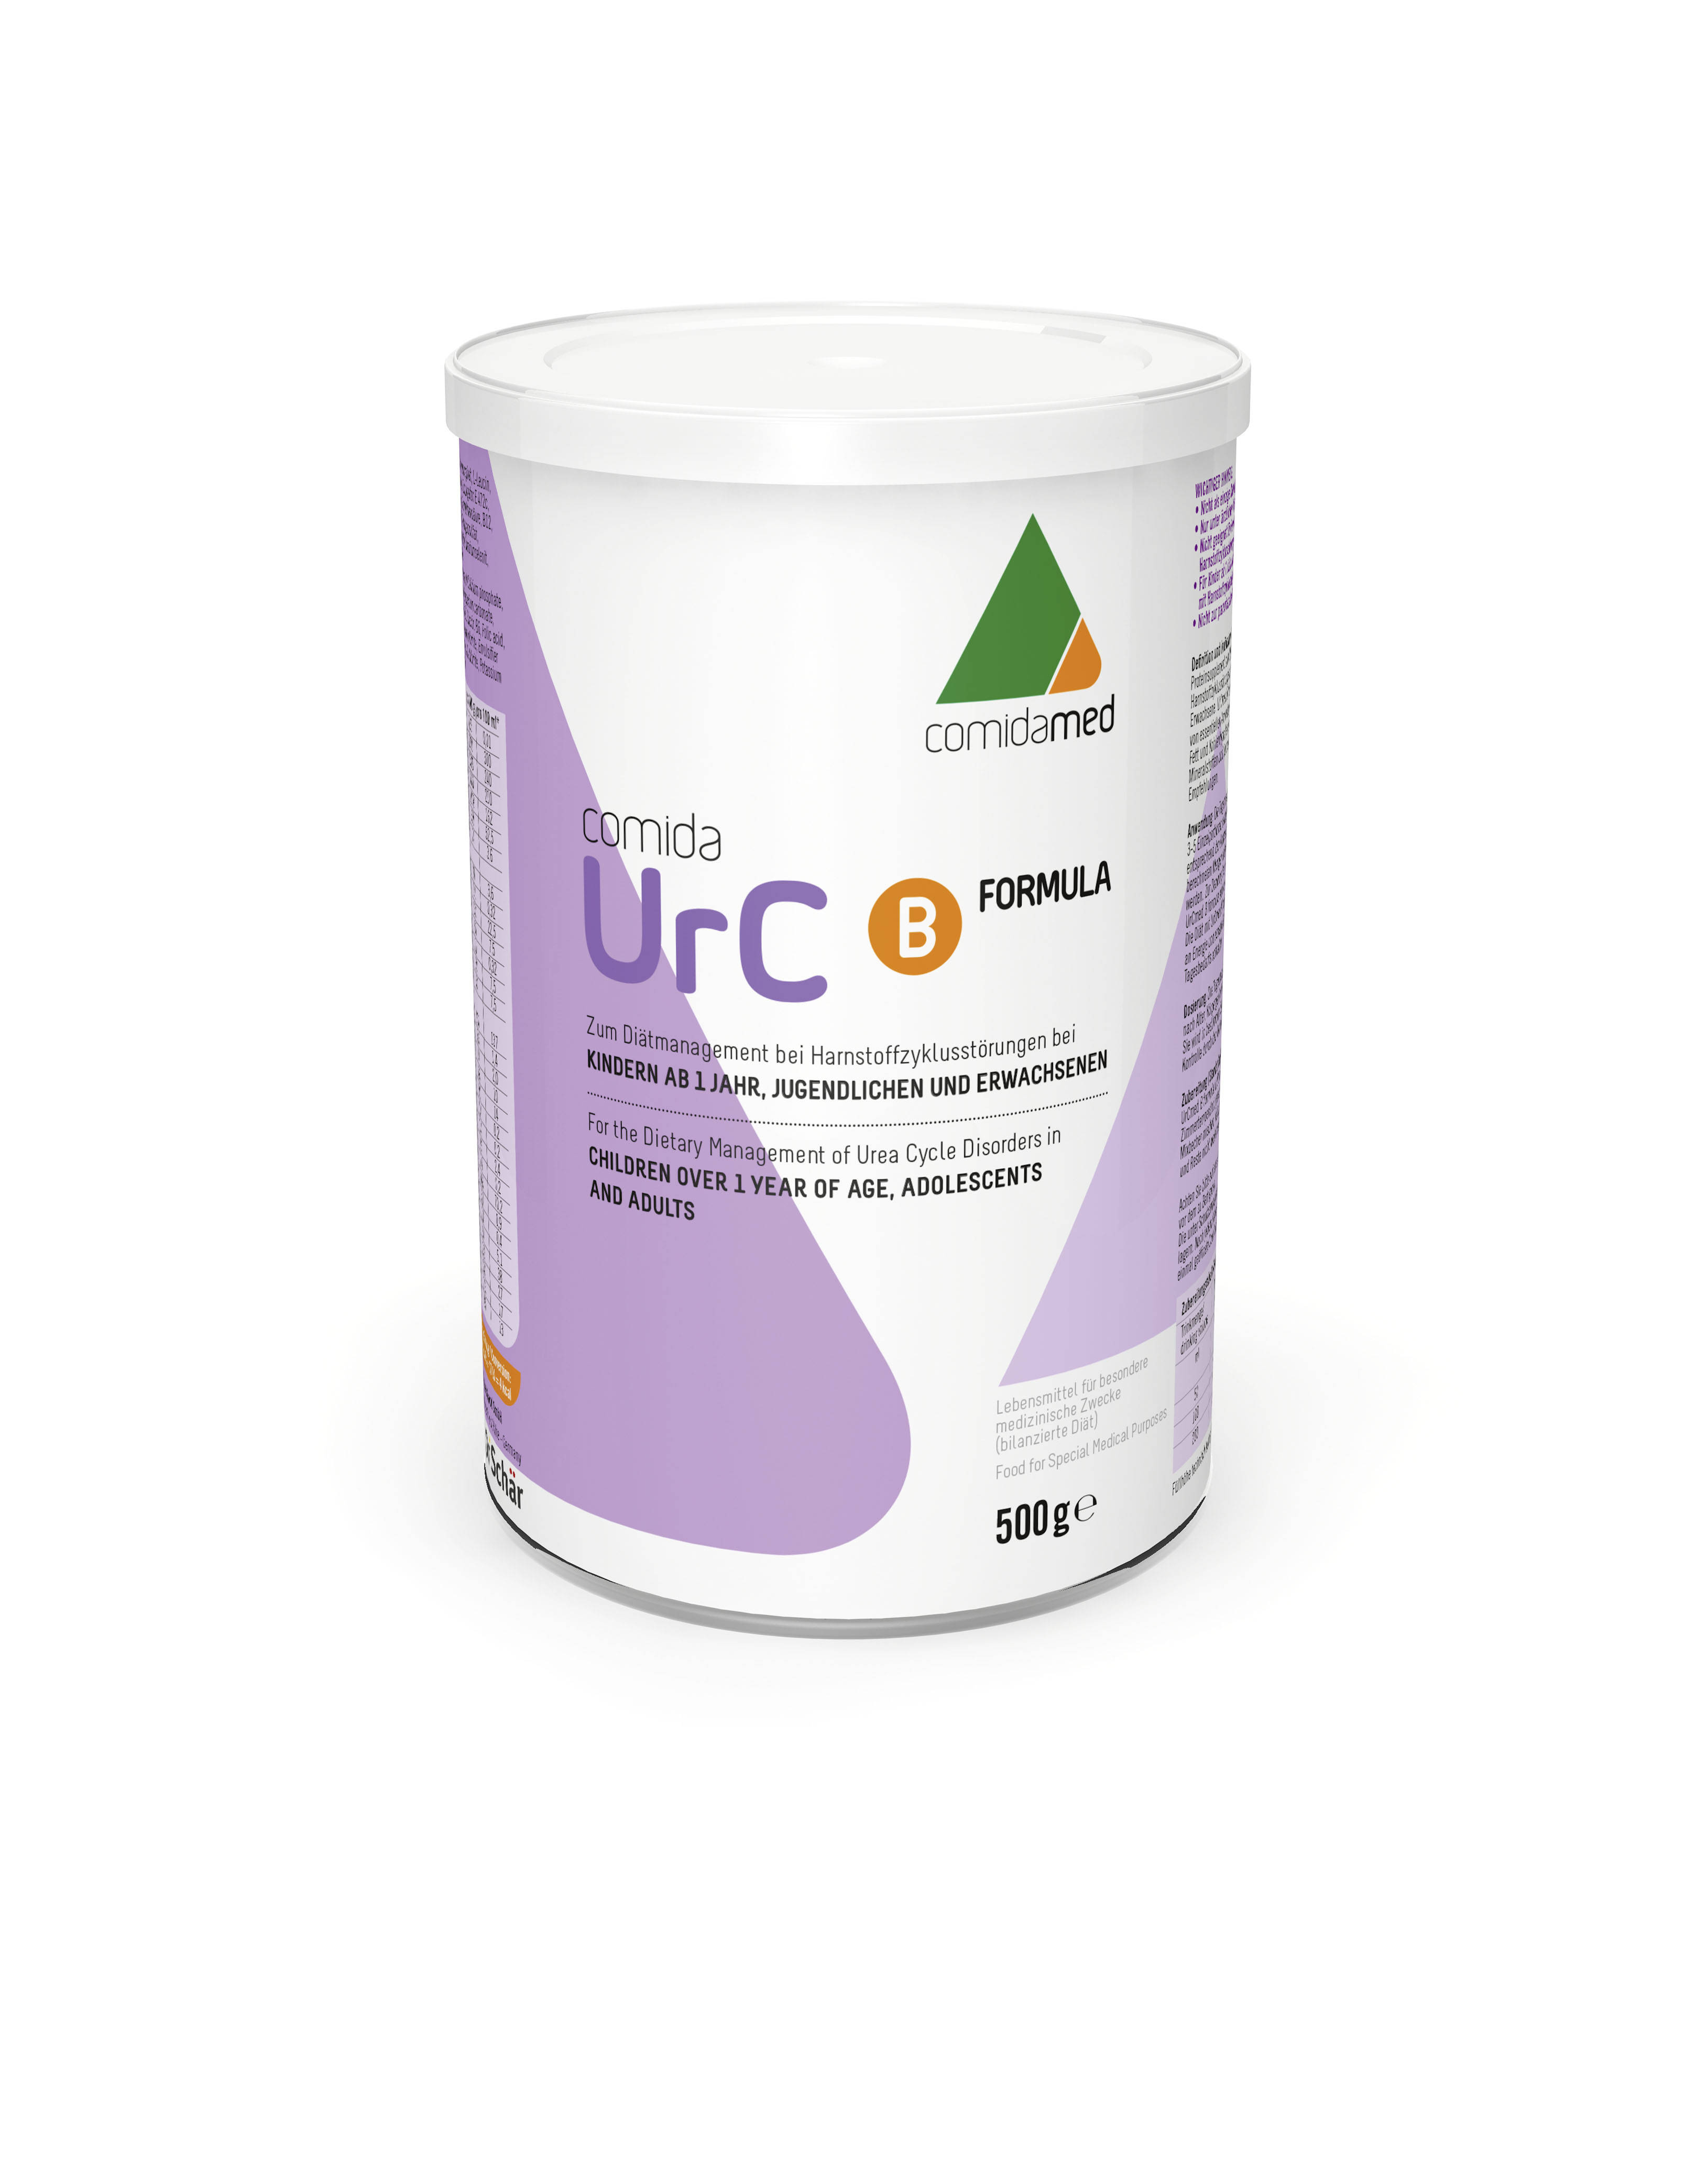 comida-UrC B FORMULA